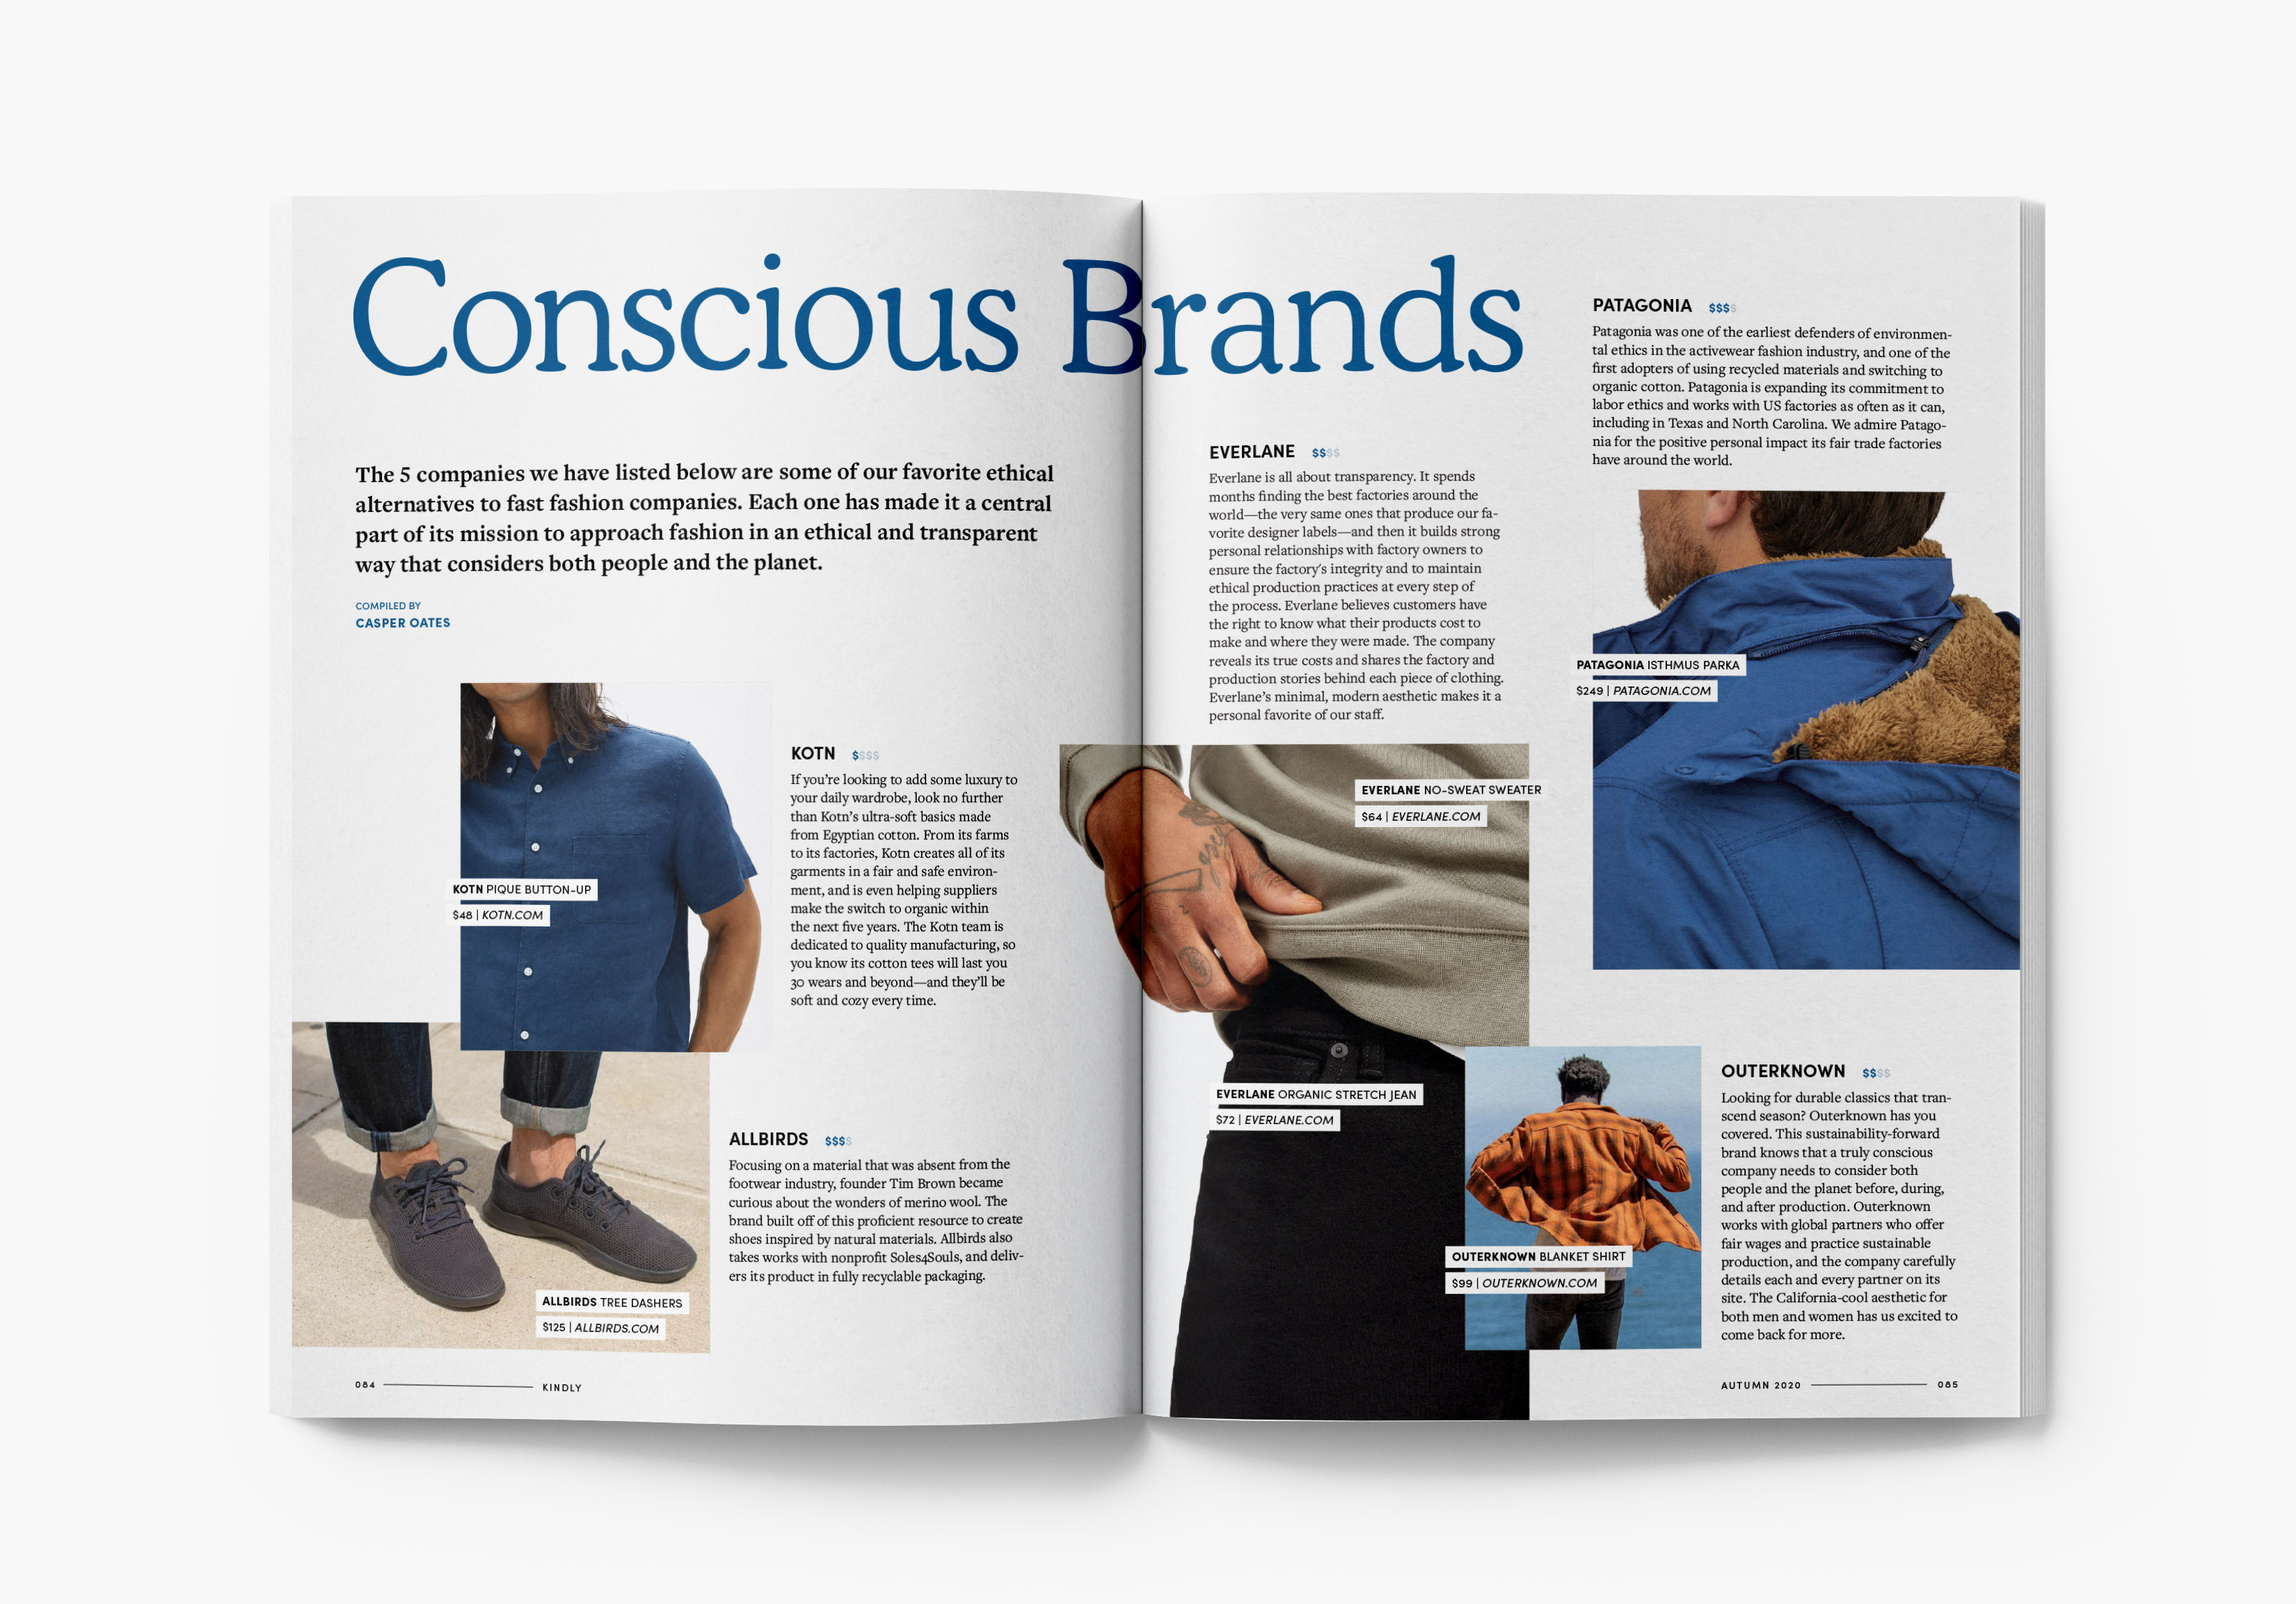 Magazine spread showcasing conscious clothing brands